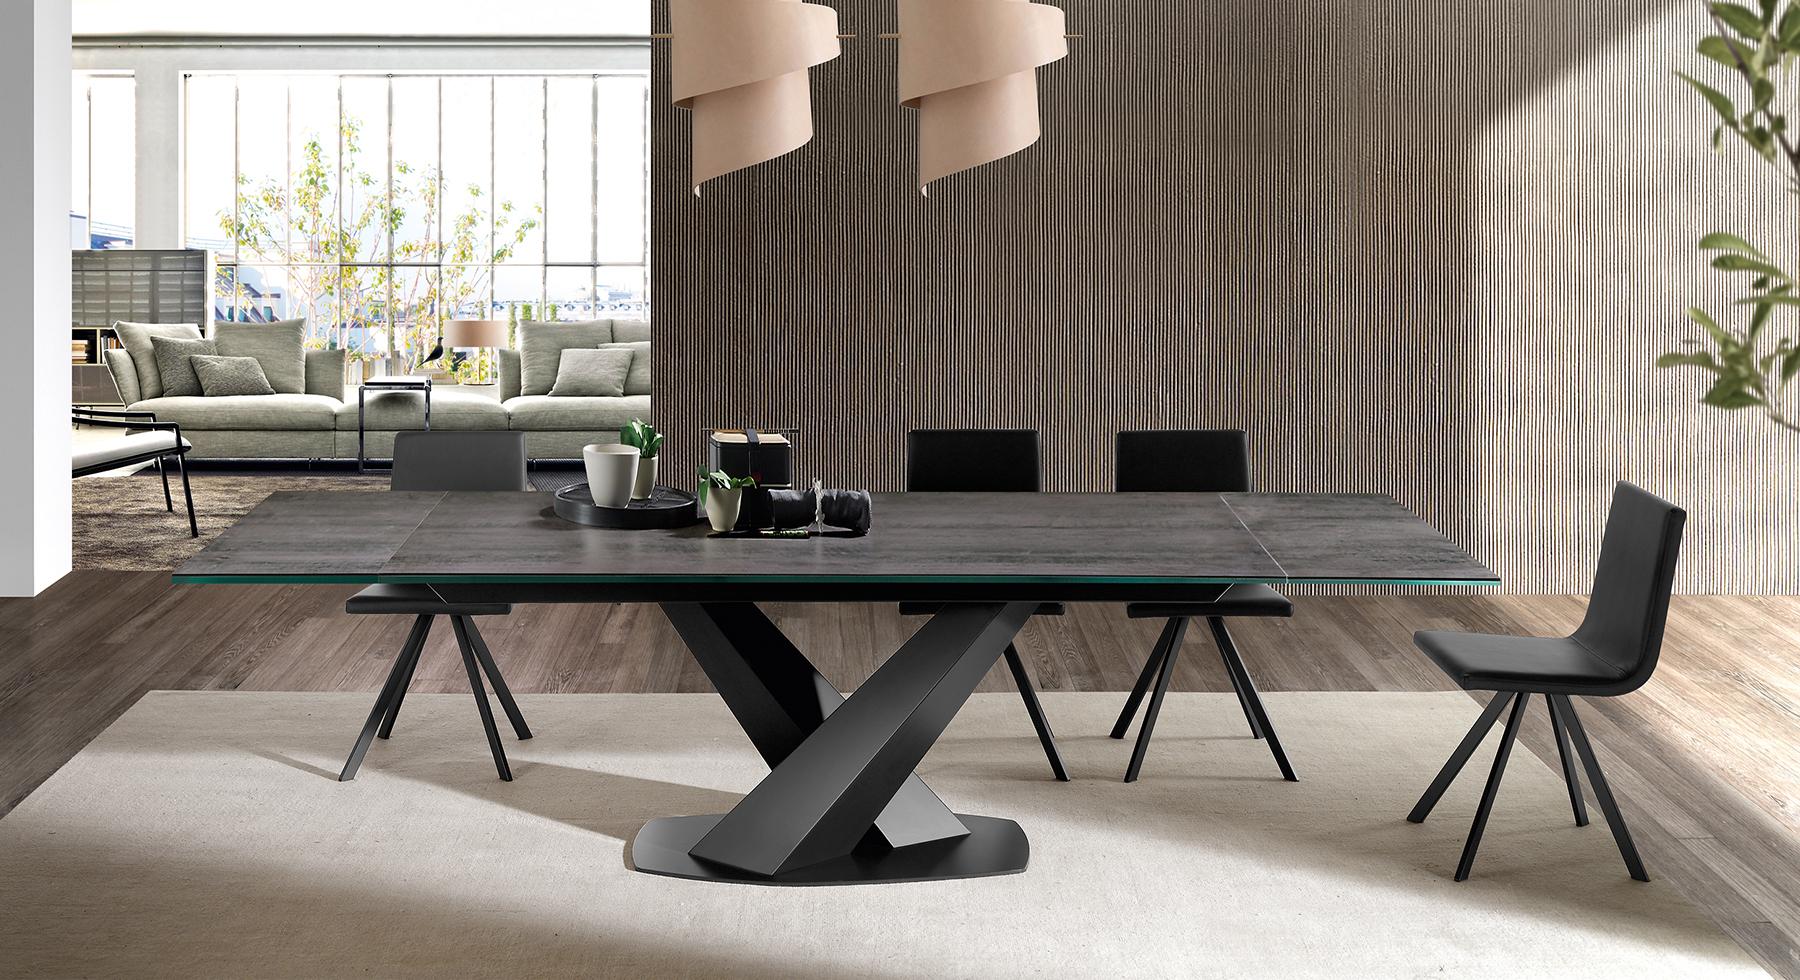 Ramiro tarazona mesas de comedor mesas centro sillas y for Mesas de comedor cuadradas de diseno